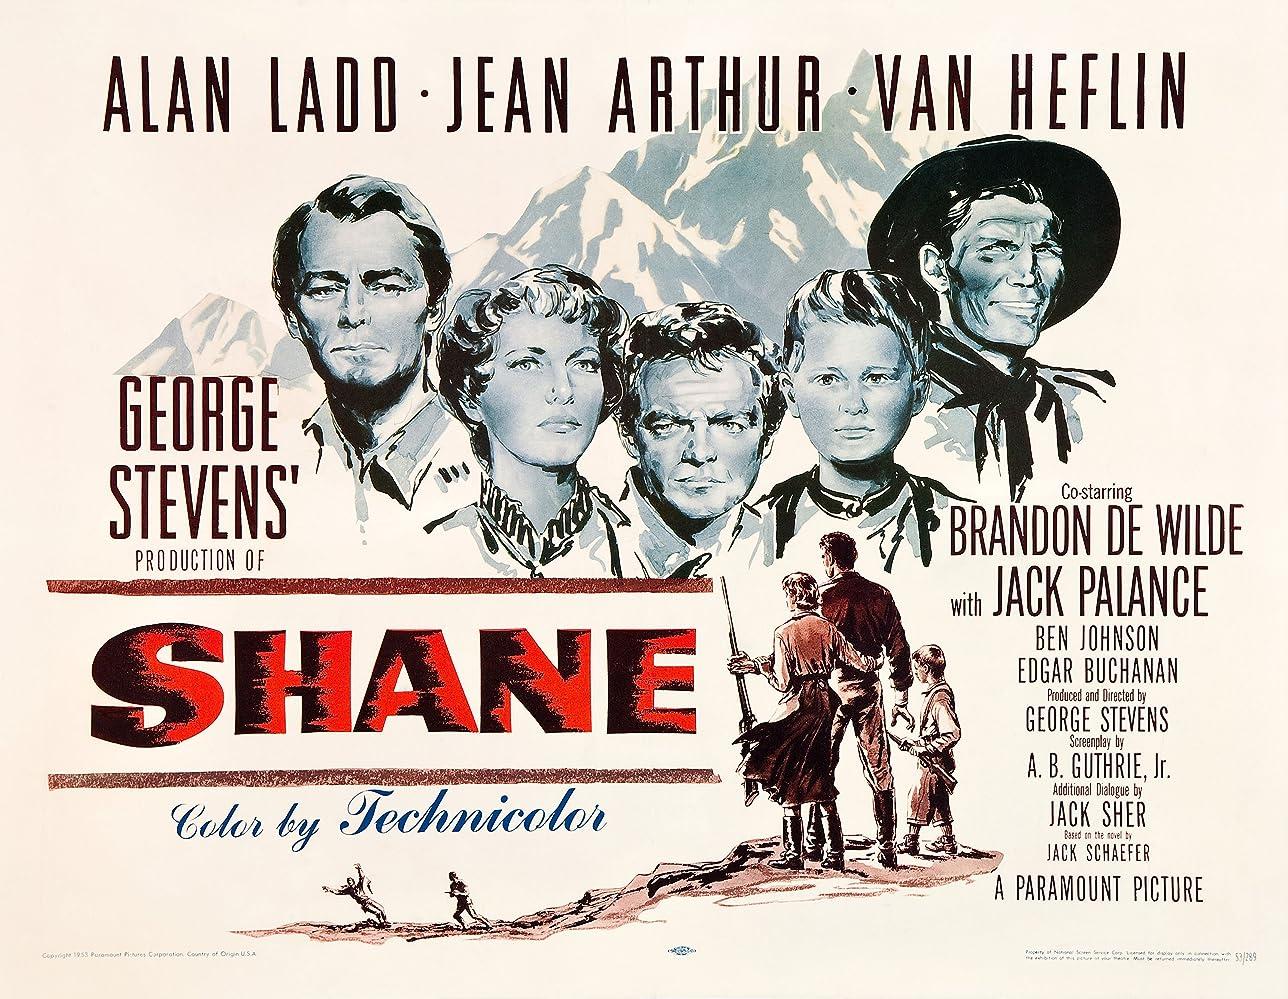 Alan Ladd, Jean Arthur, Brandon De Wilde, Van Heflin, and Jack Palance in Shane (1953)